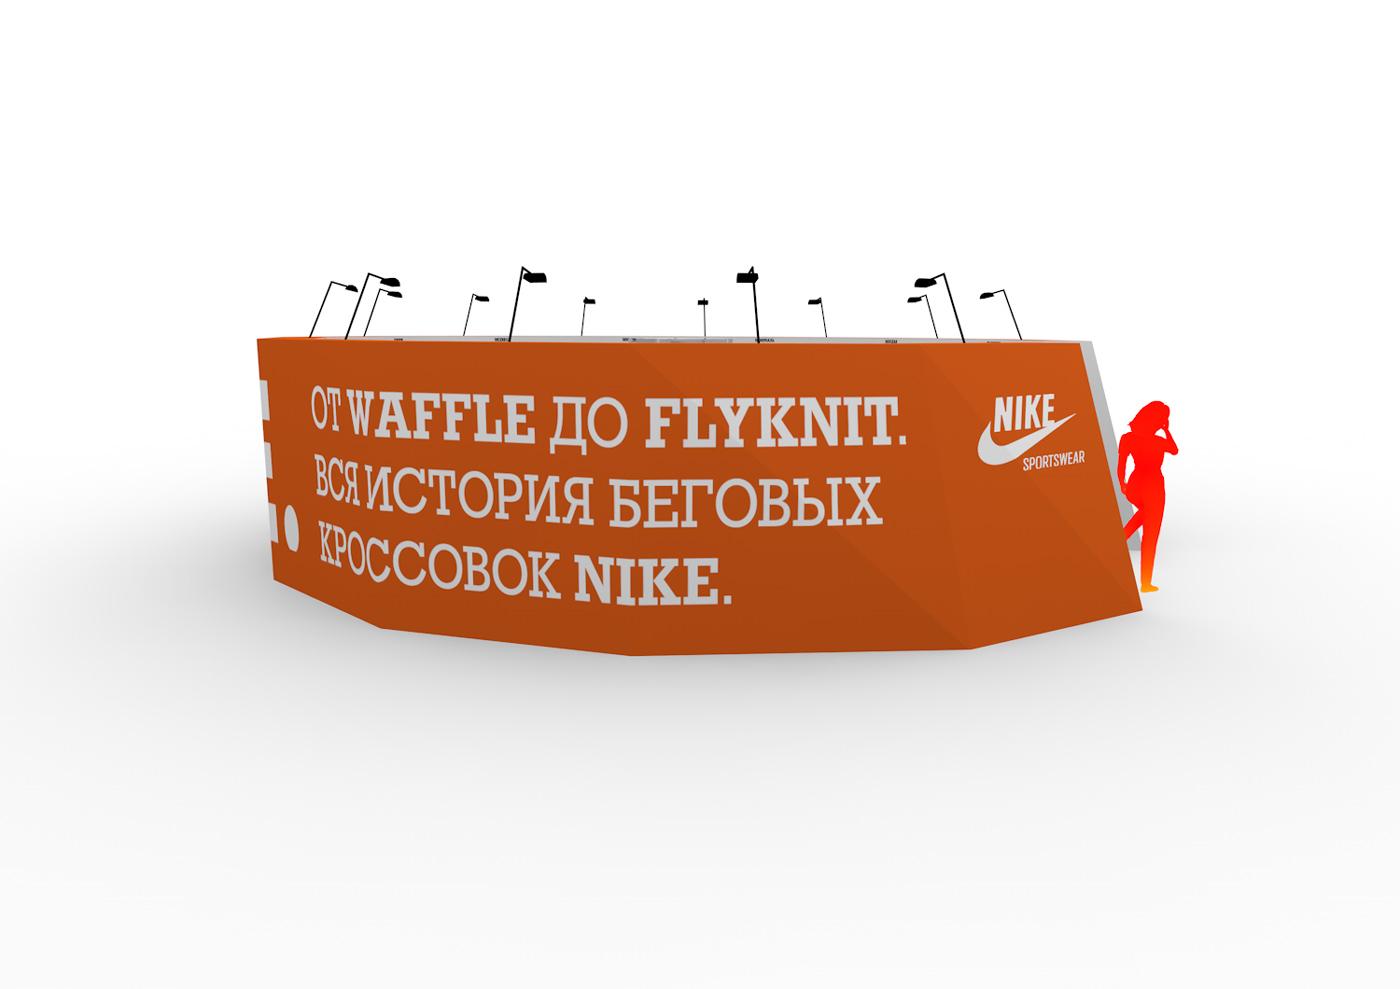 NikeTimeline_portfolio_1400x790_11.jpg